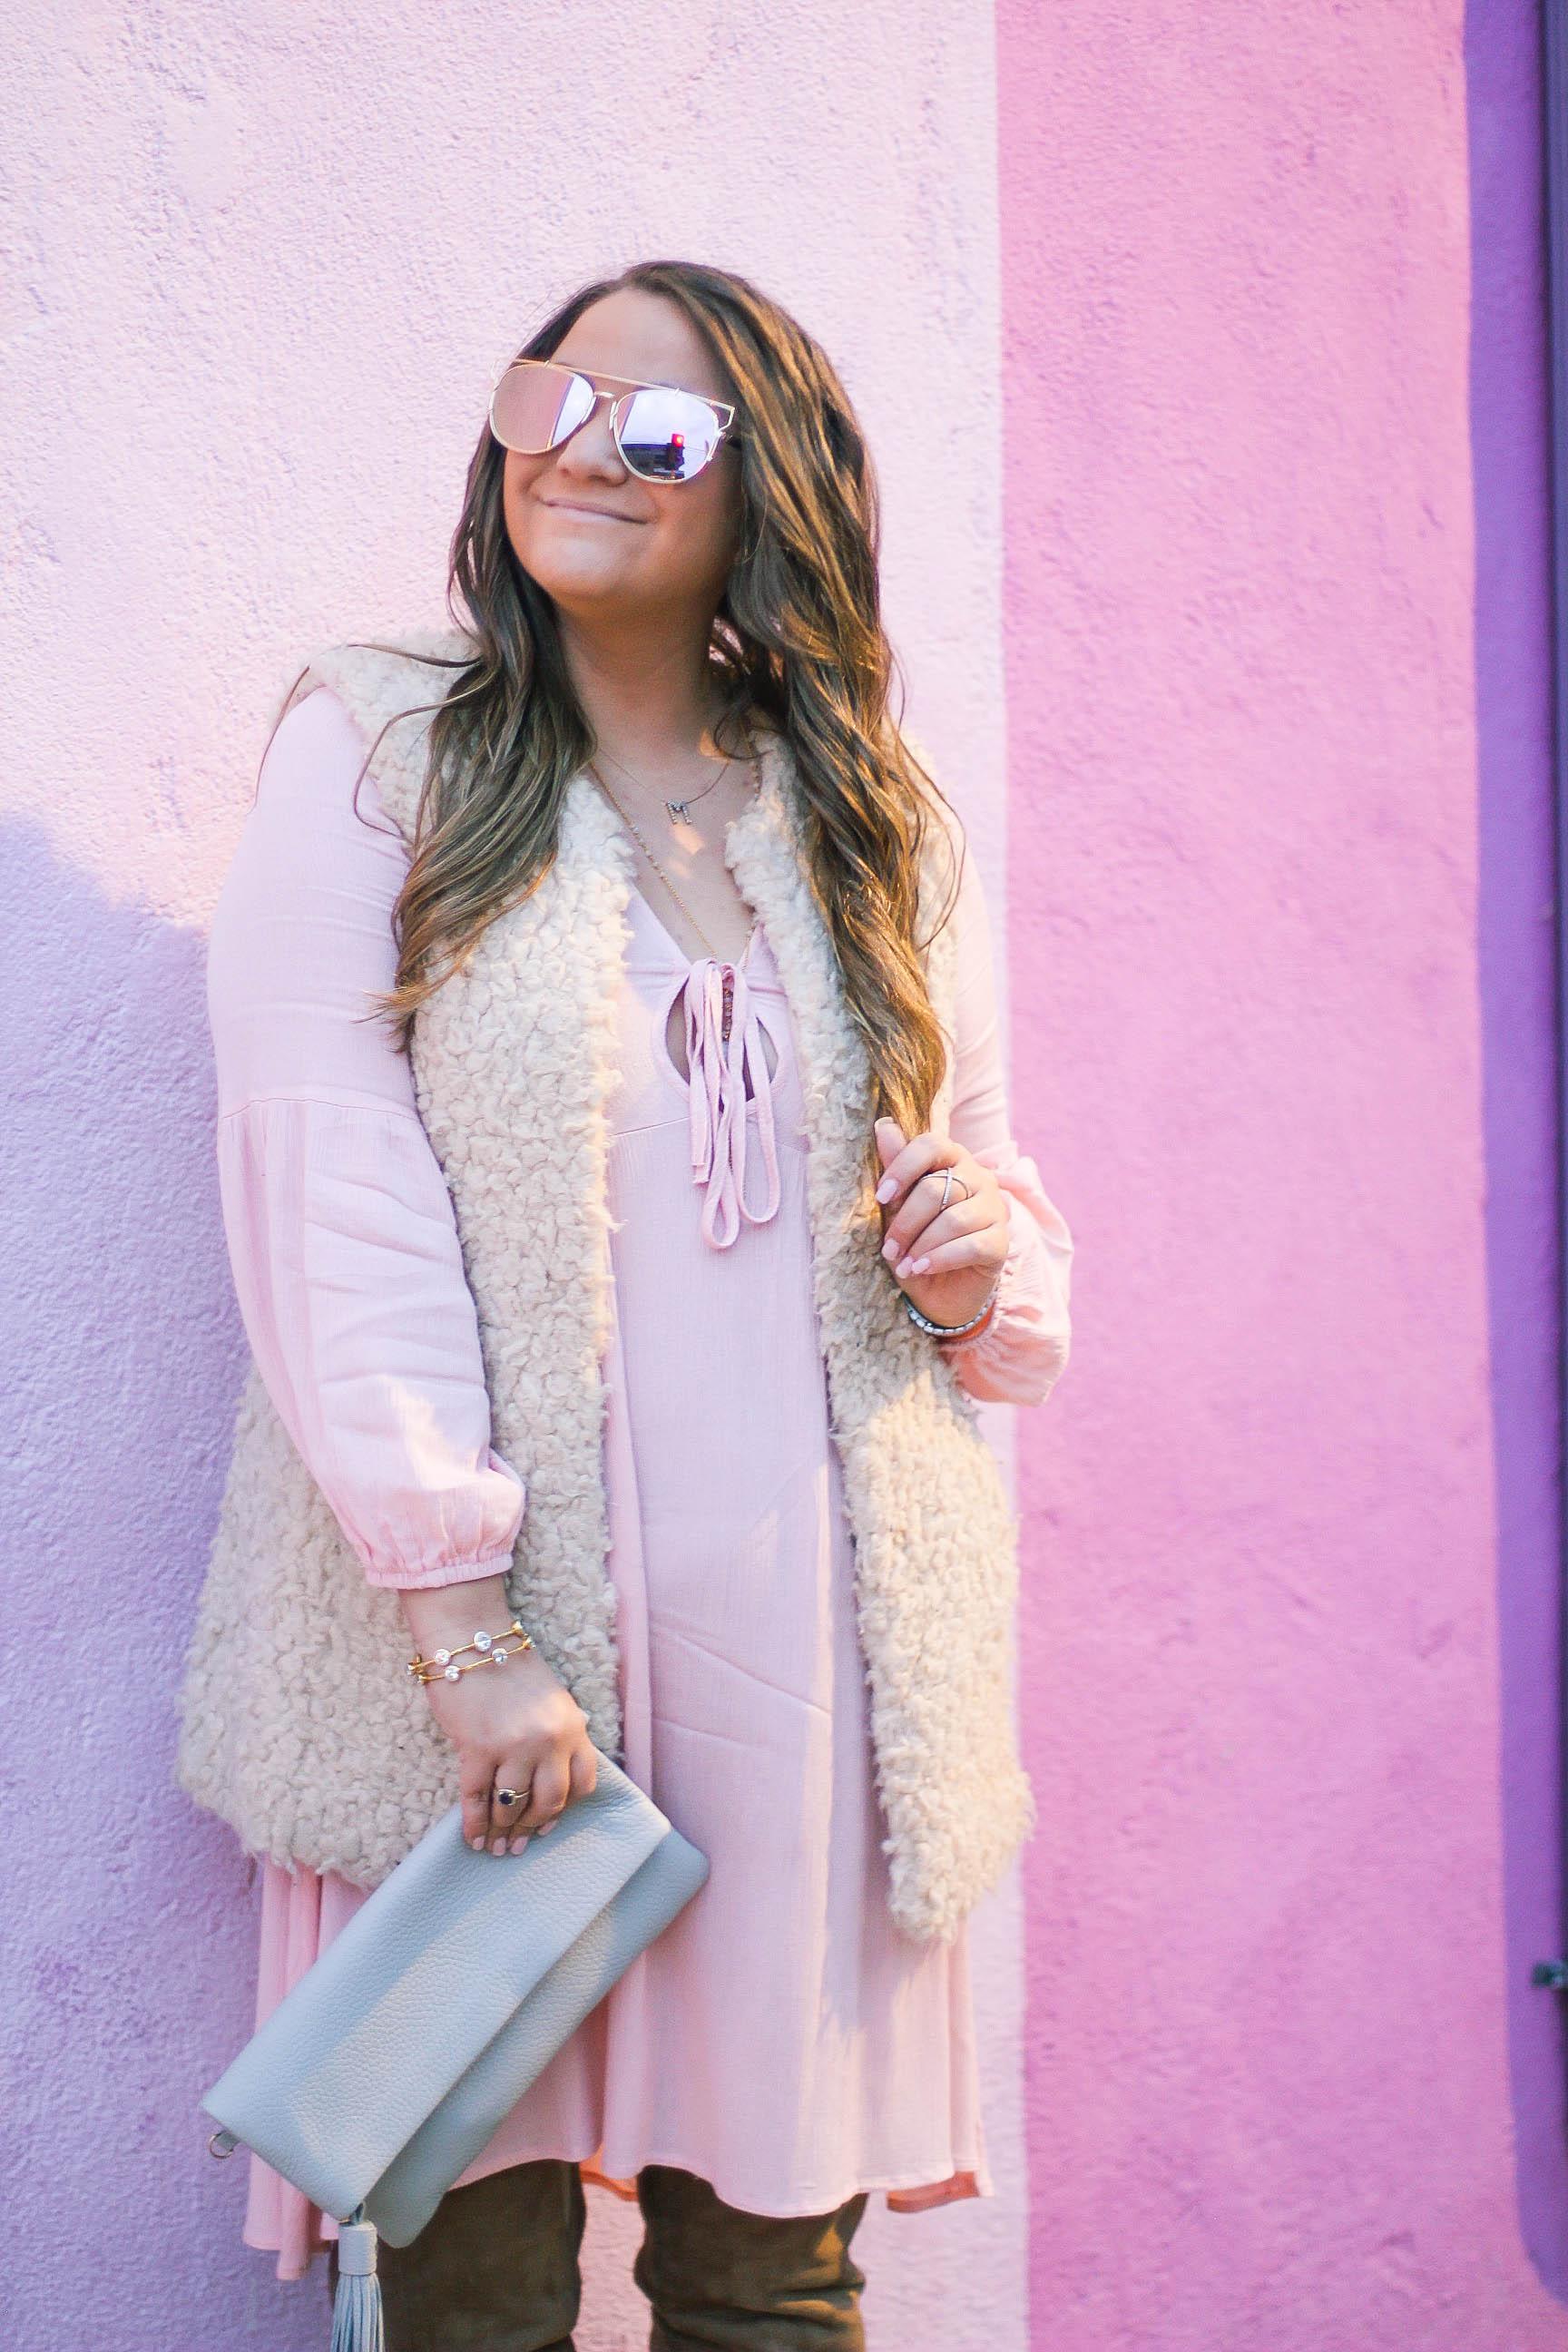 missyonmadison, melissa tierney, fashion blogger, la blogger, la style, fall style, zaful, pink dress, pink a line dress, faux fur vest, gigi ny, gigi new york clutch, otk boots, beige otk boots, style blogger, what i wore,